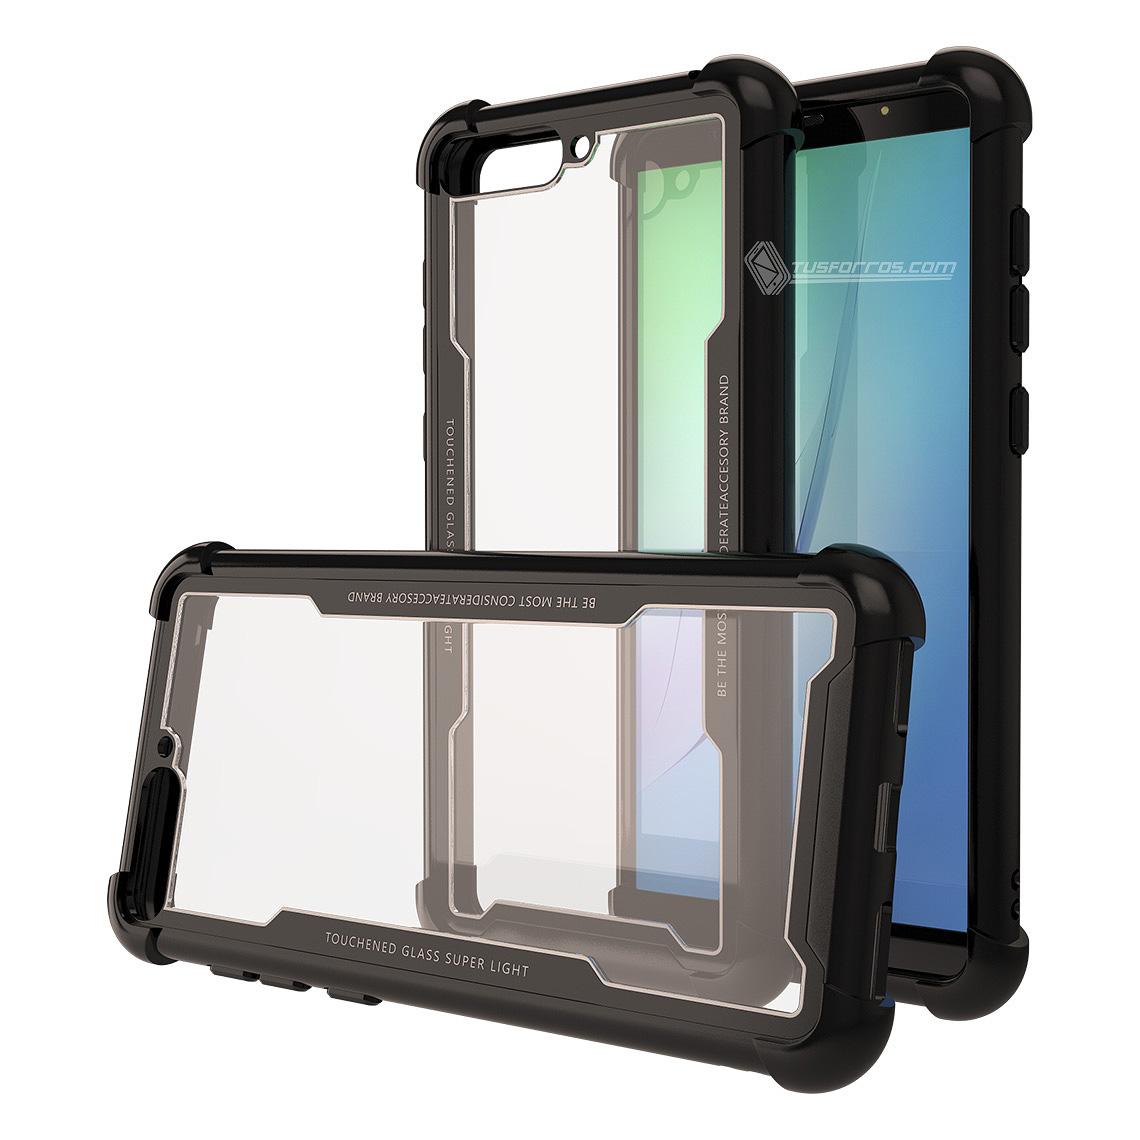 Huawei Y6 2018 Forro Anti-Shock Edge Black BackCover Cristal Clear